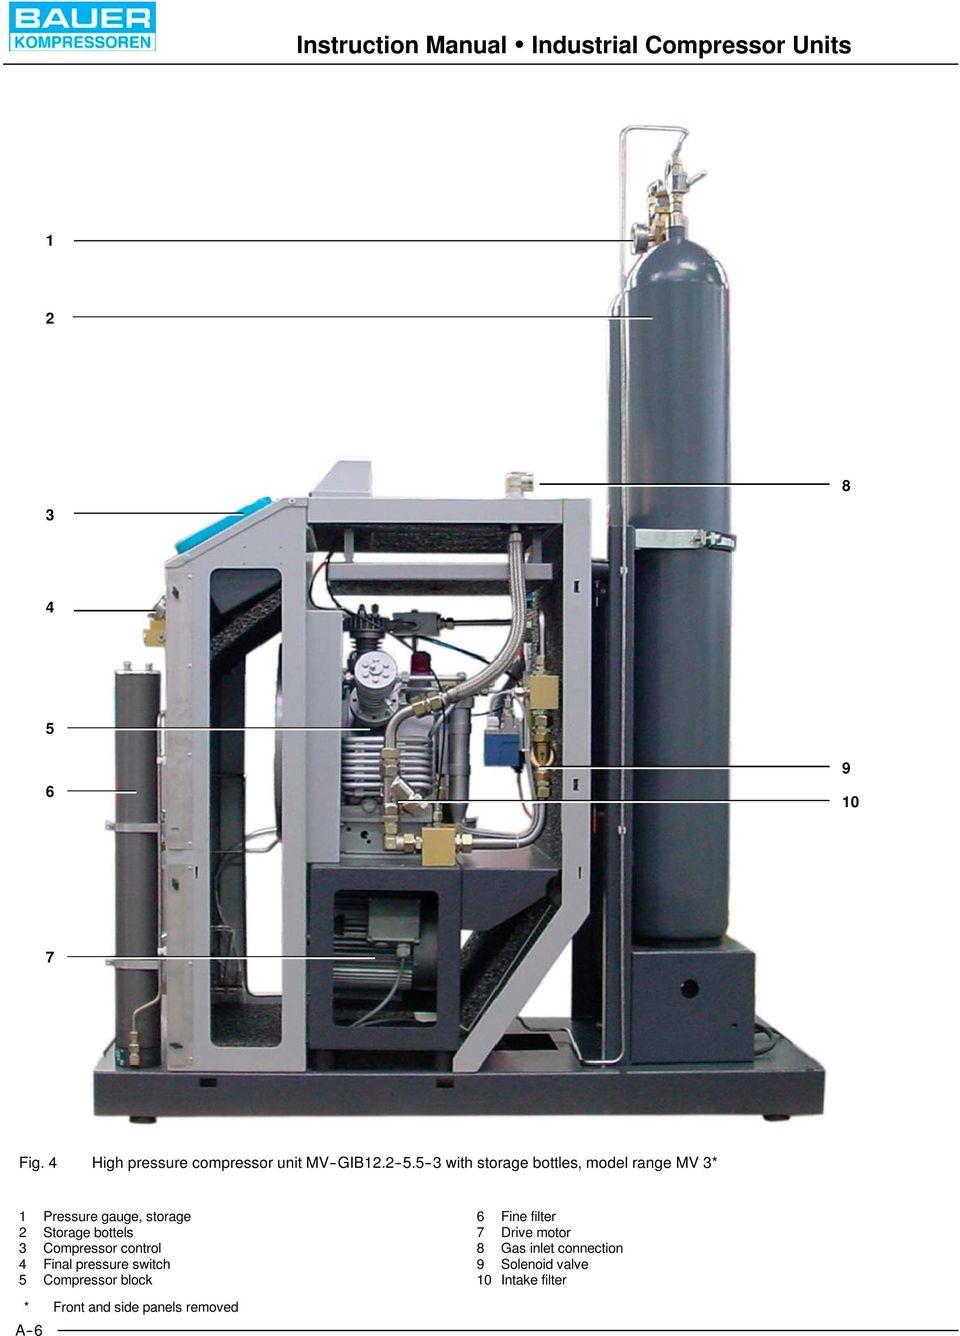 hight resolution of bottels 3 compressor control 4 final pressure switch 5 compressor block 6 fine filter